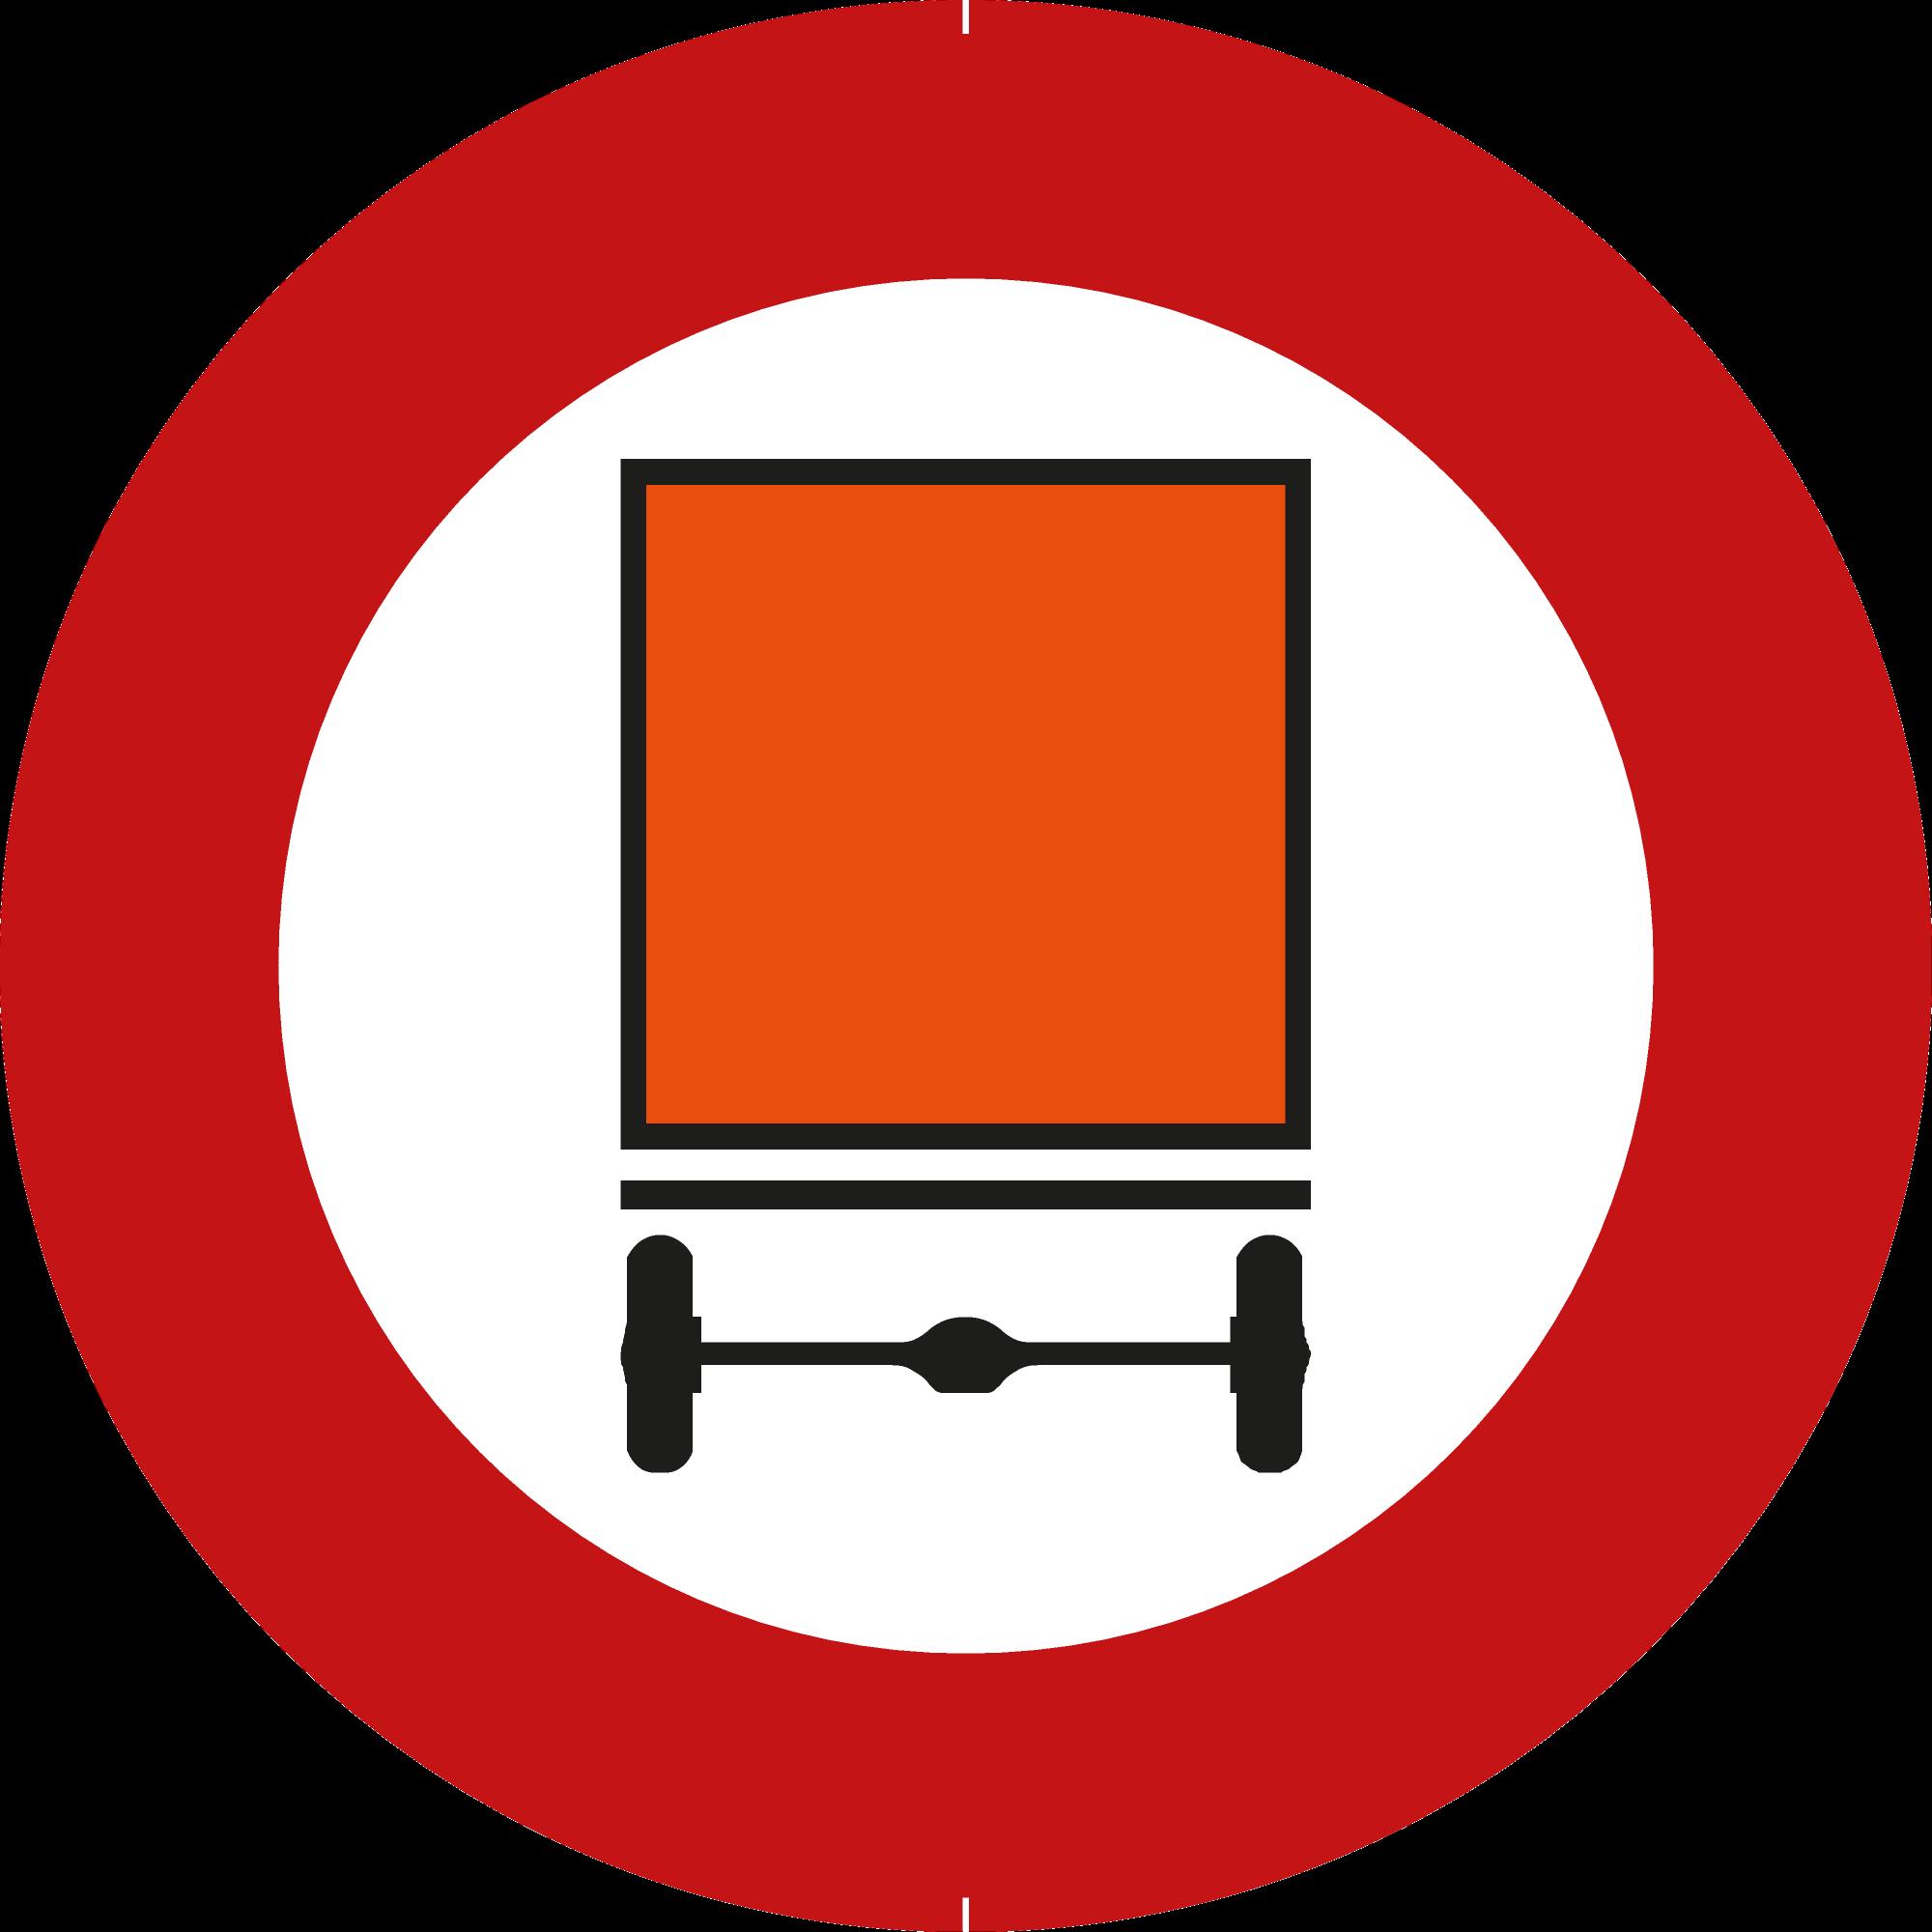 Signface - C24a - klasse  I - Ø 400 mm